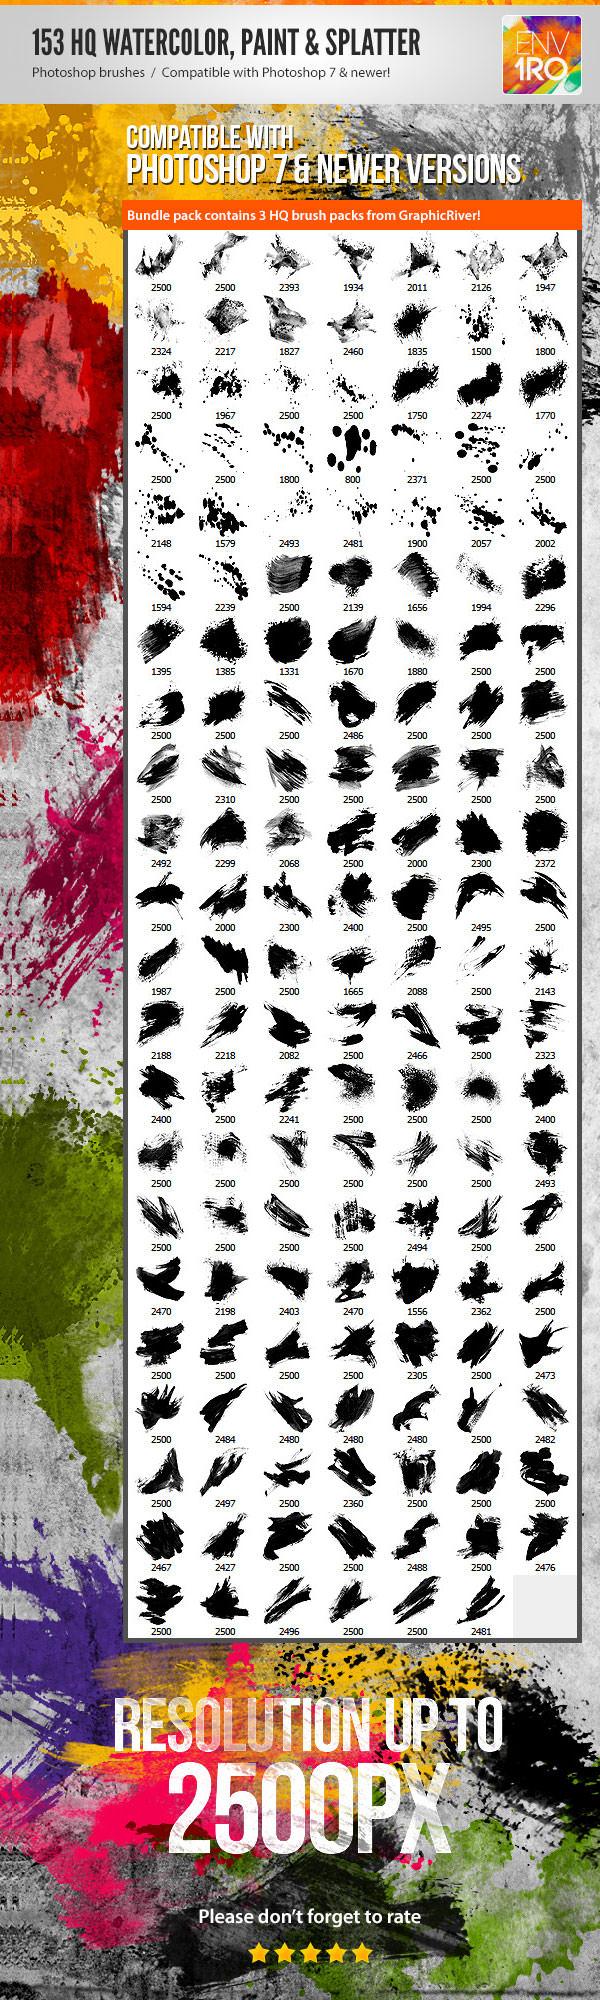 153 watercolor paint splatter photoshop brushes